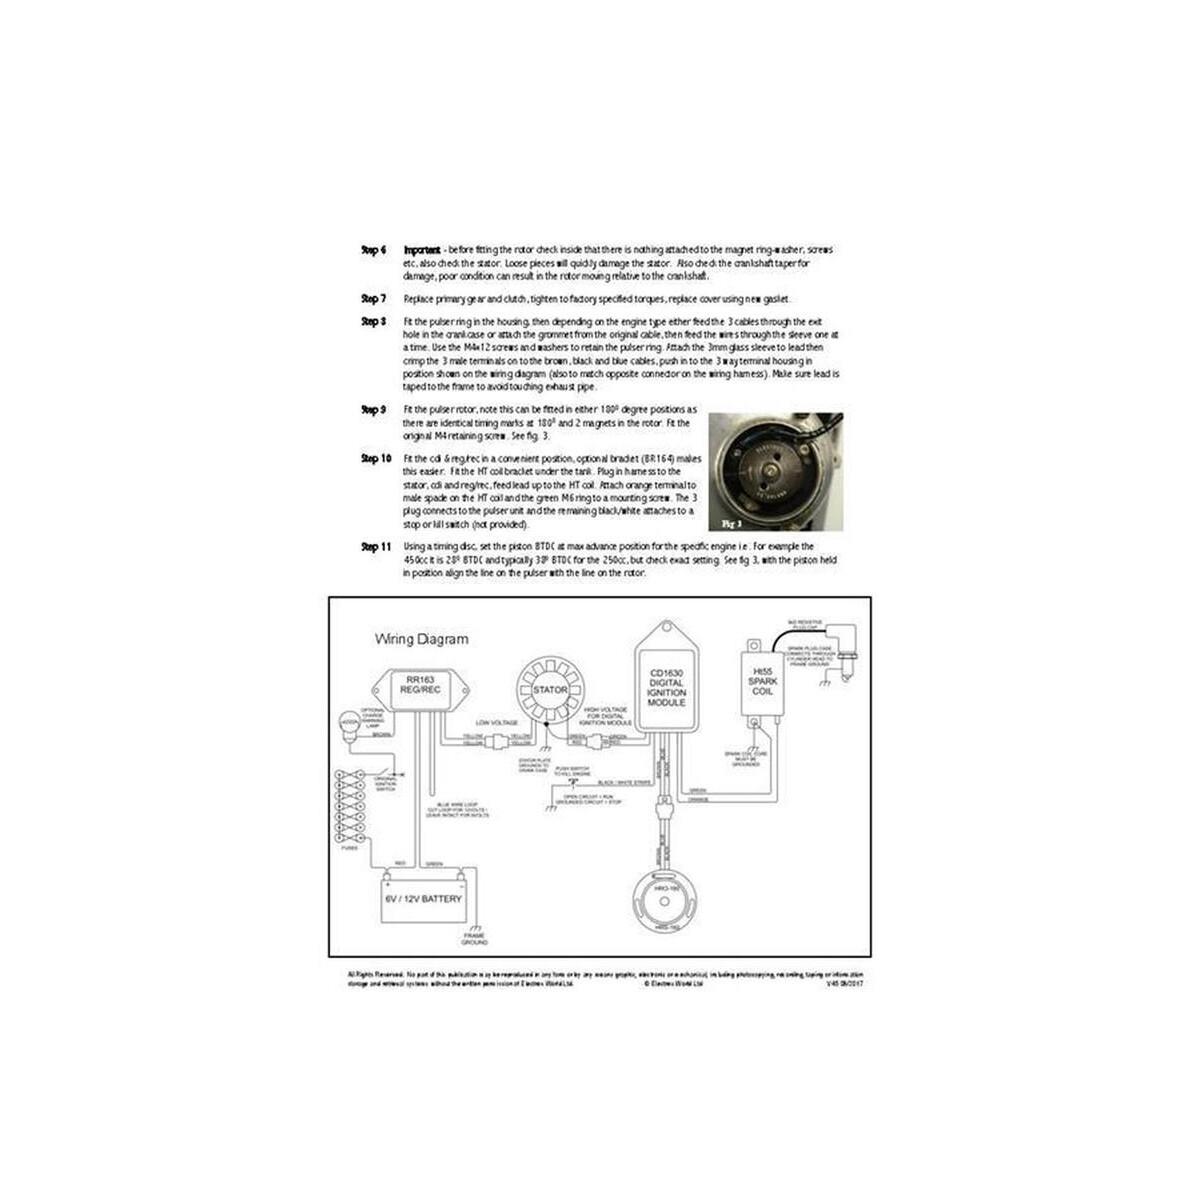 Stk 164 12 Volt Wide Case Ducati Singles Self Generating Digital Cdi Ignition Alternator 120w Kit